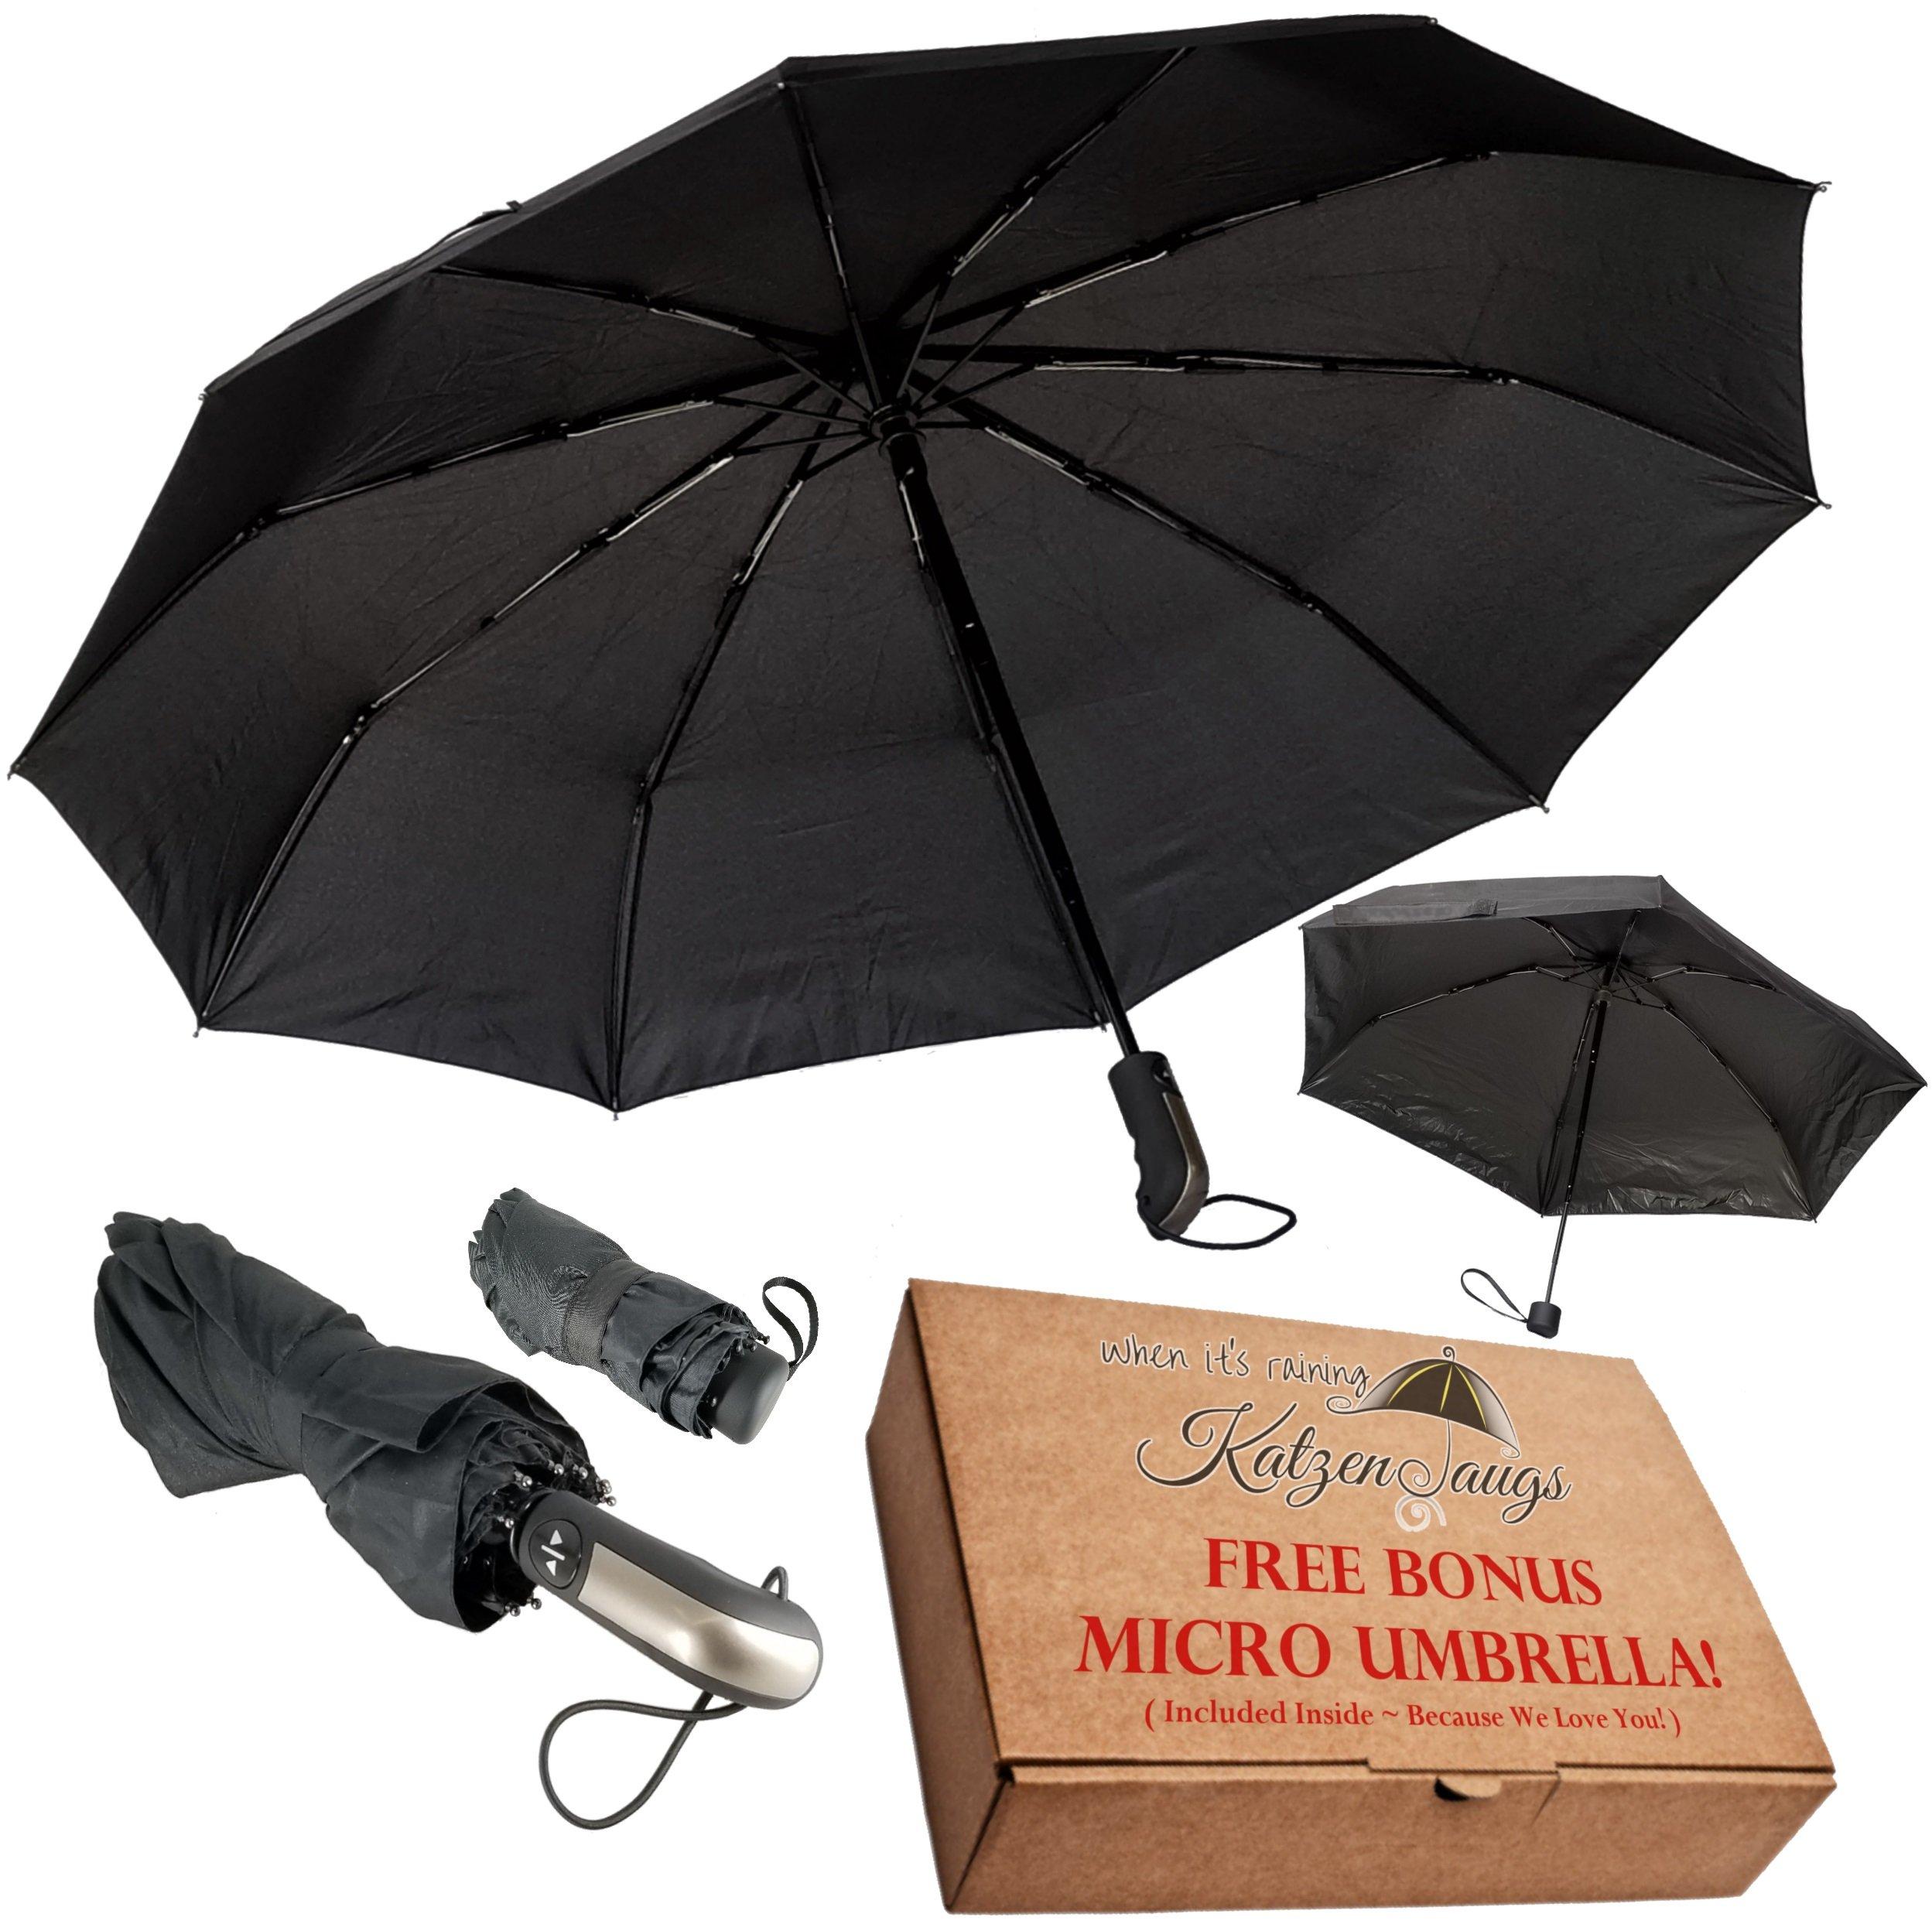 Compact Windproof Travel Umbrella -FREE Mini Black Umbrella- Katzendaügs 2pc Black by Katzendaügs Umbrella Co. (Image #1)